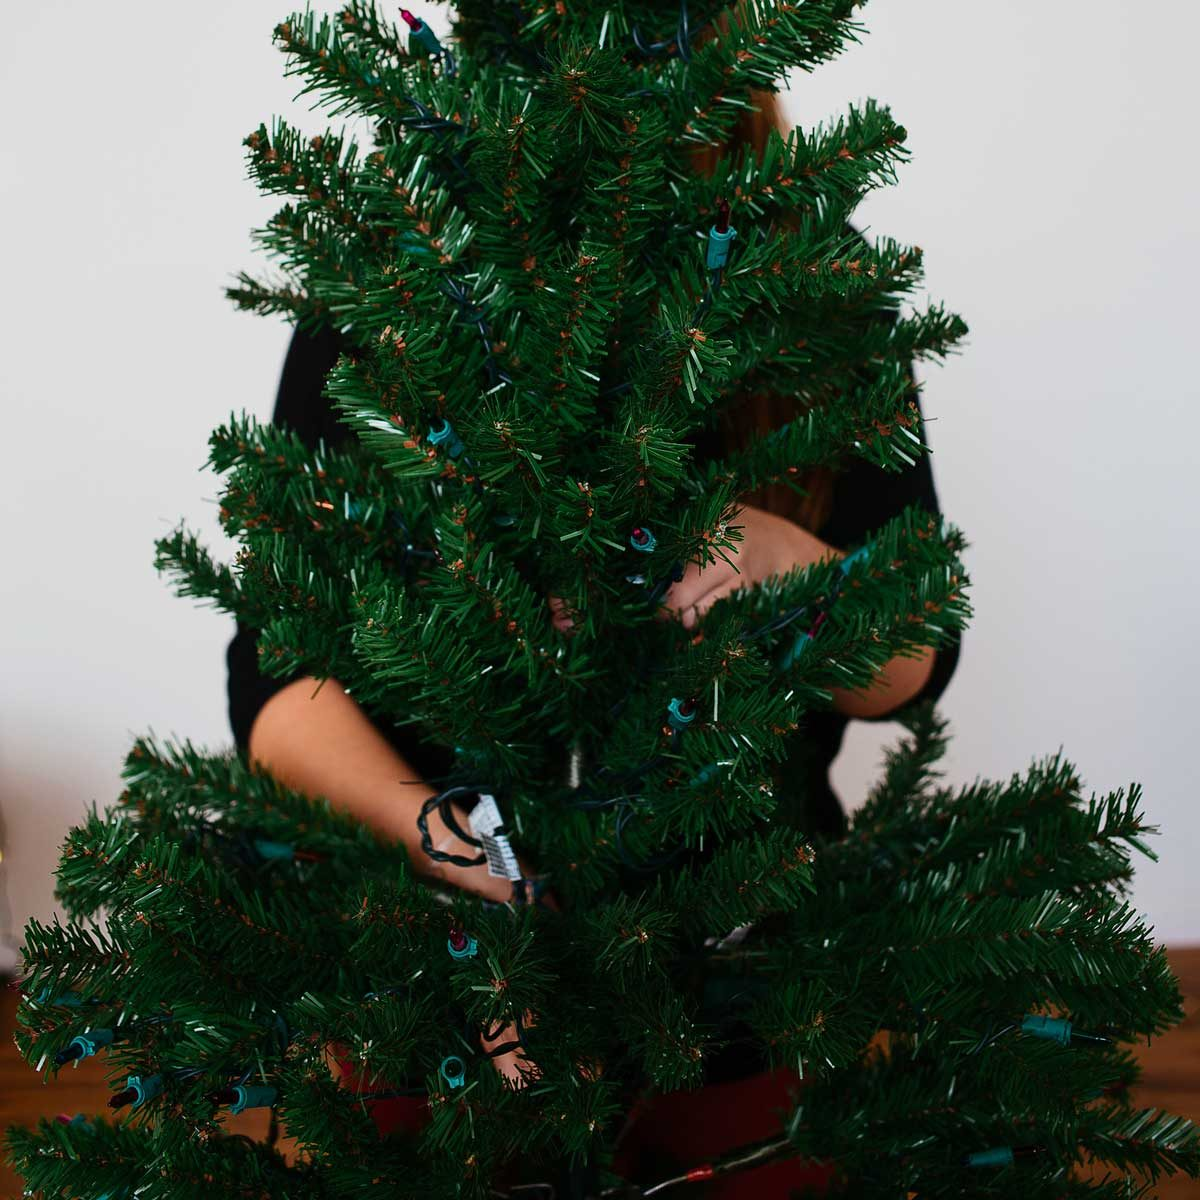 Putting away an artificial Christmas tree